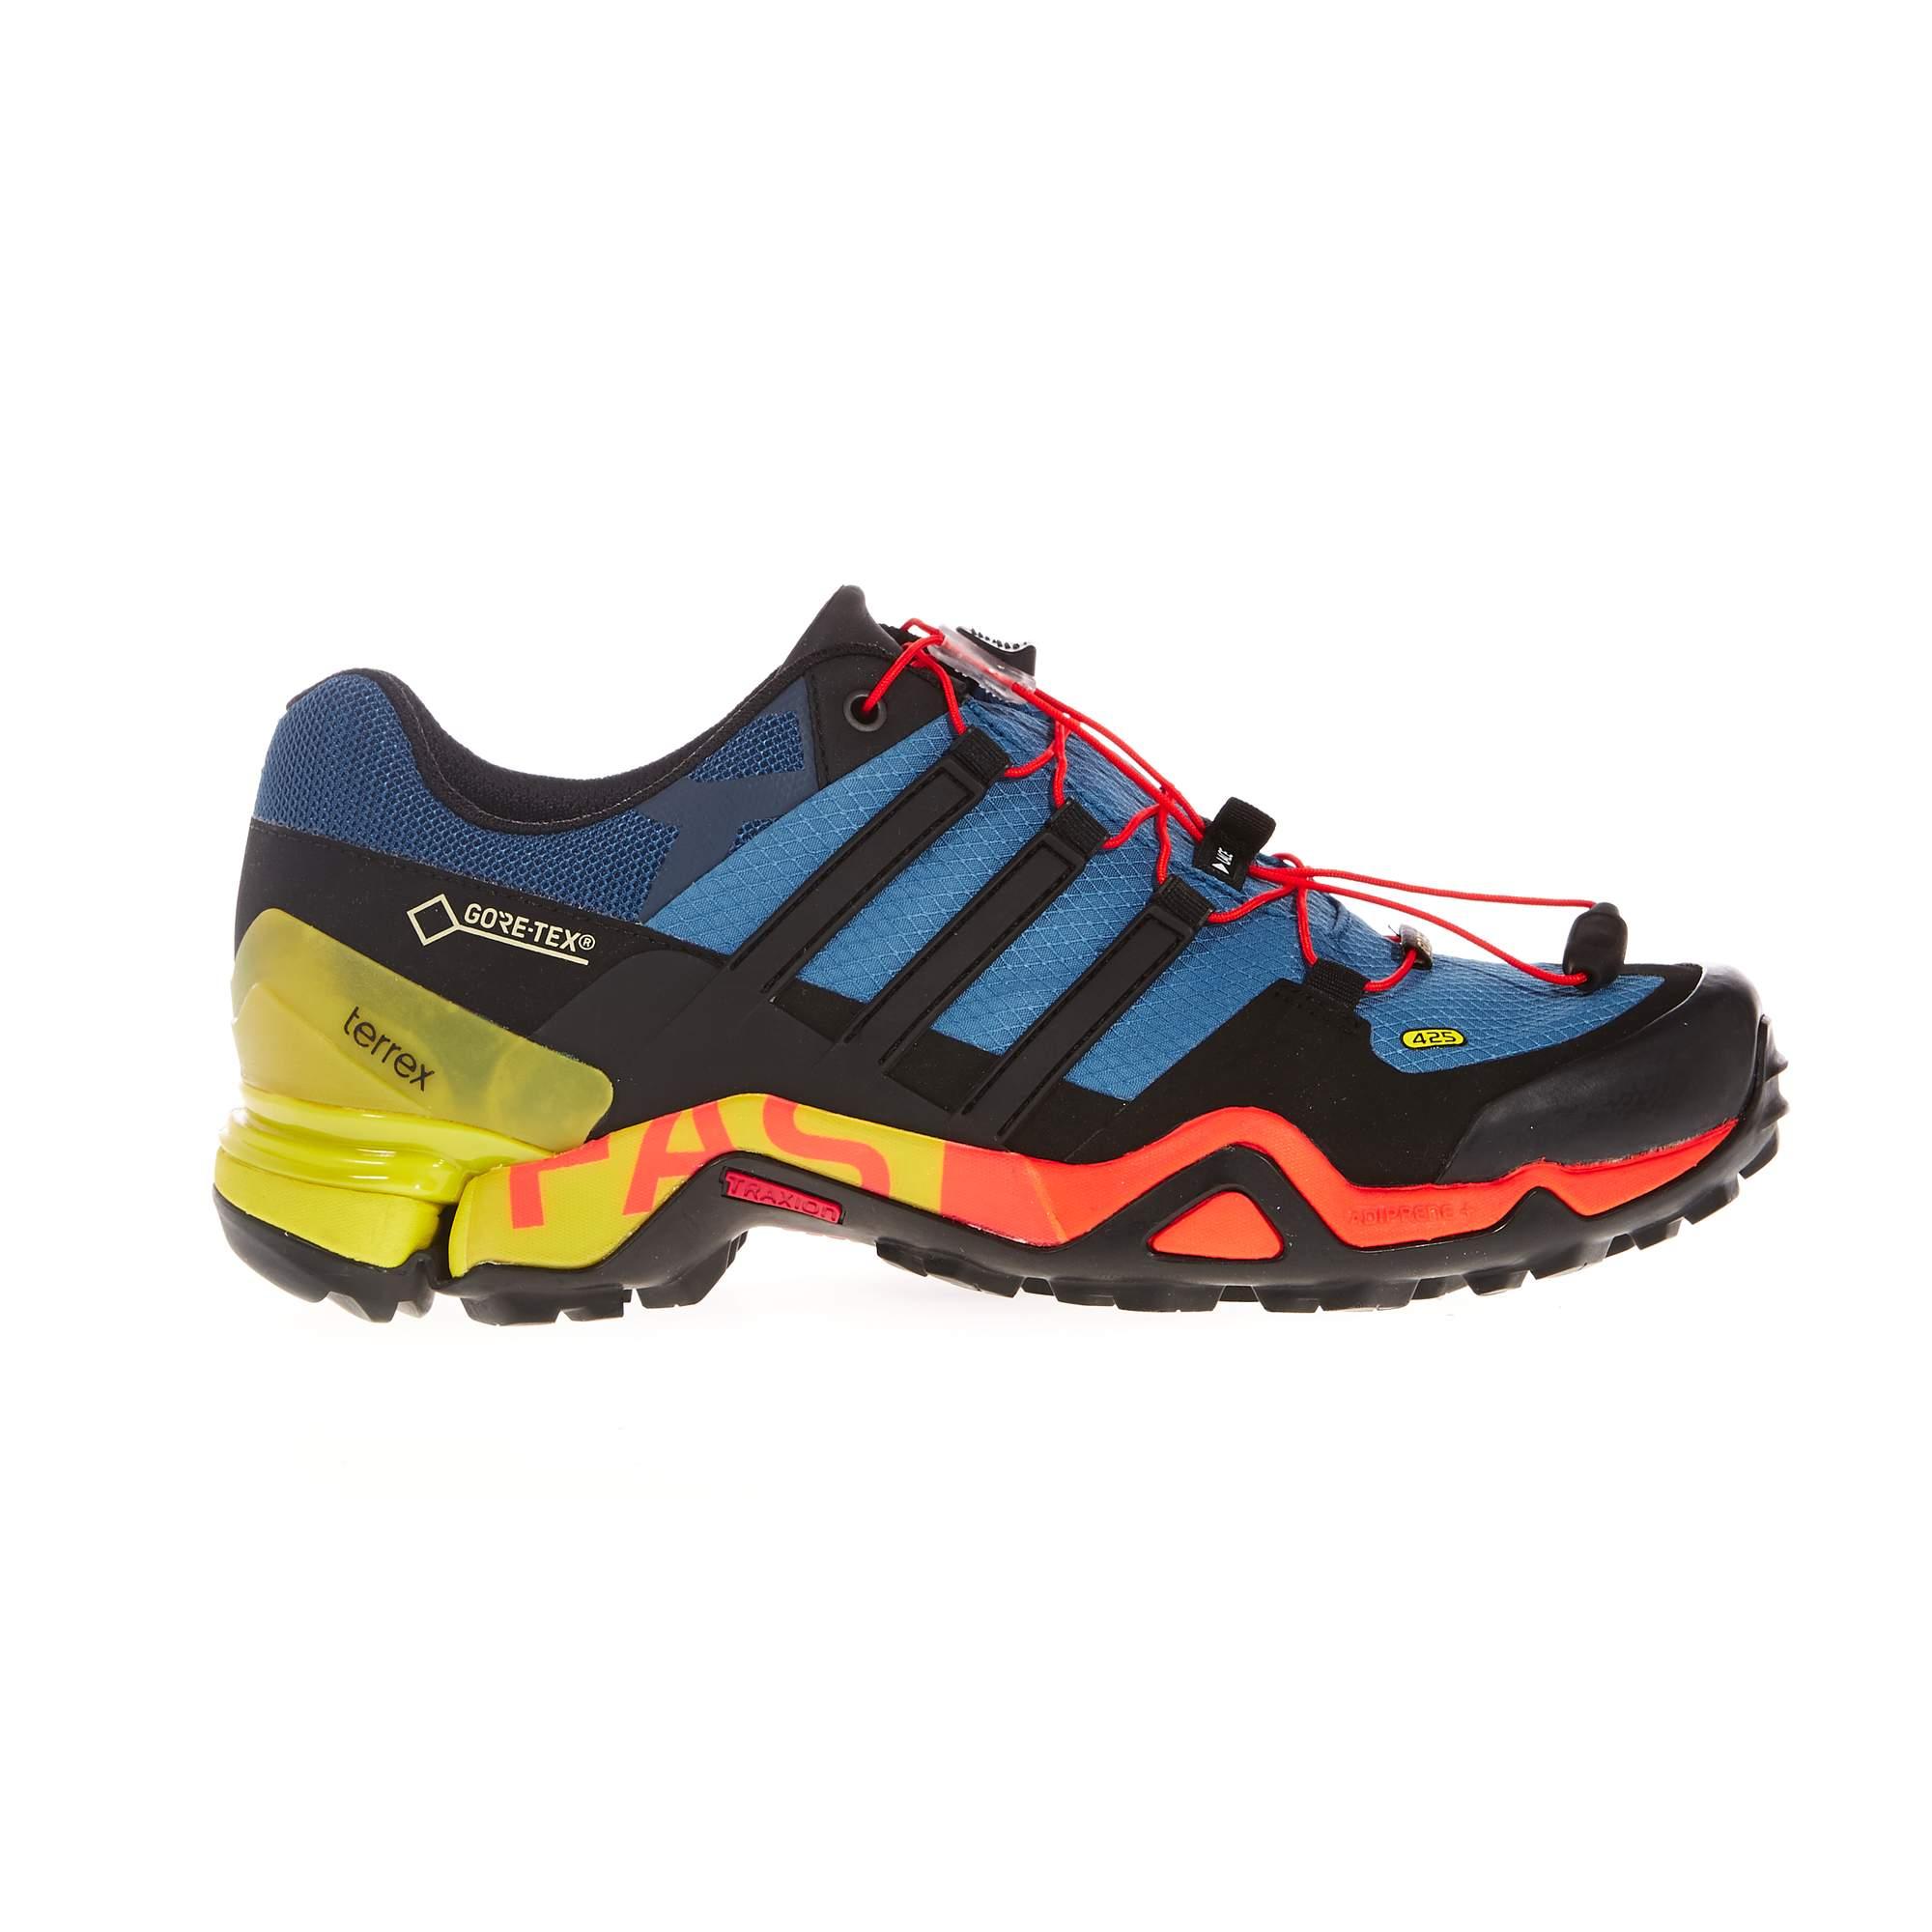 Adidas Terrex Fast R Mid Gtx Blue Outdoor Shoes